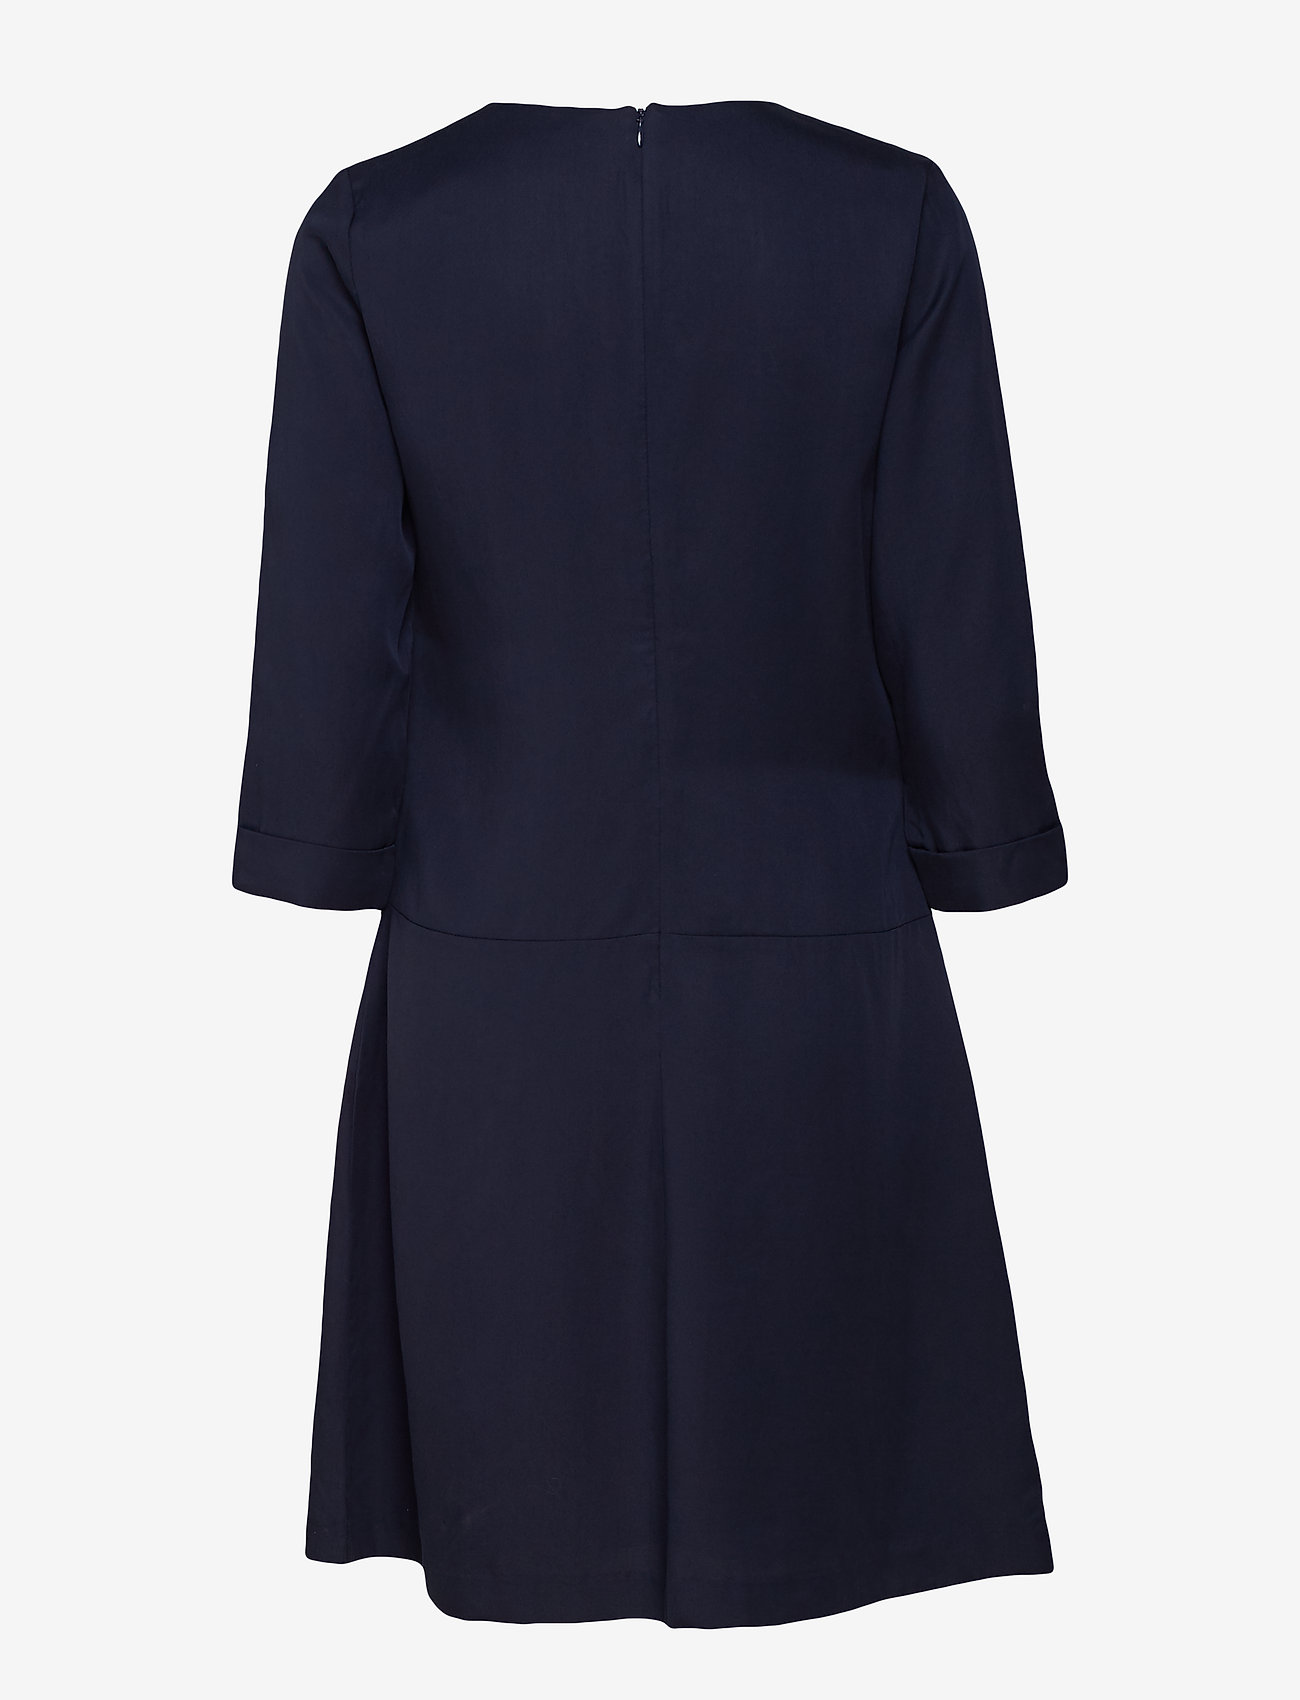 Dress (Navy) - Park Lane 7ktwa2